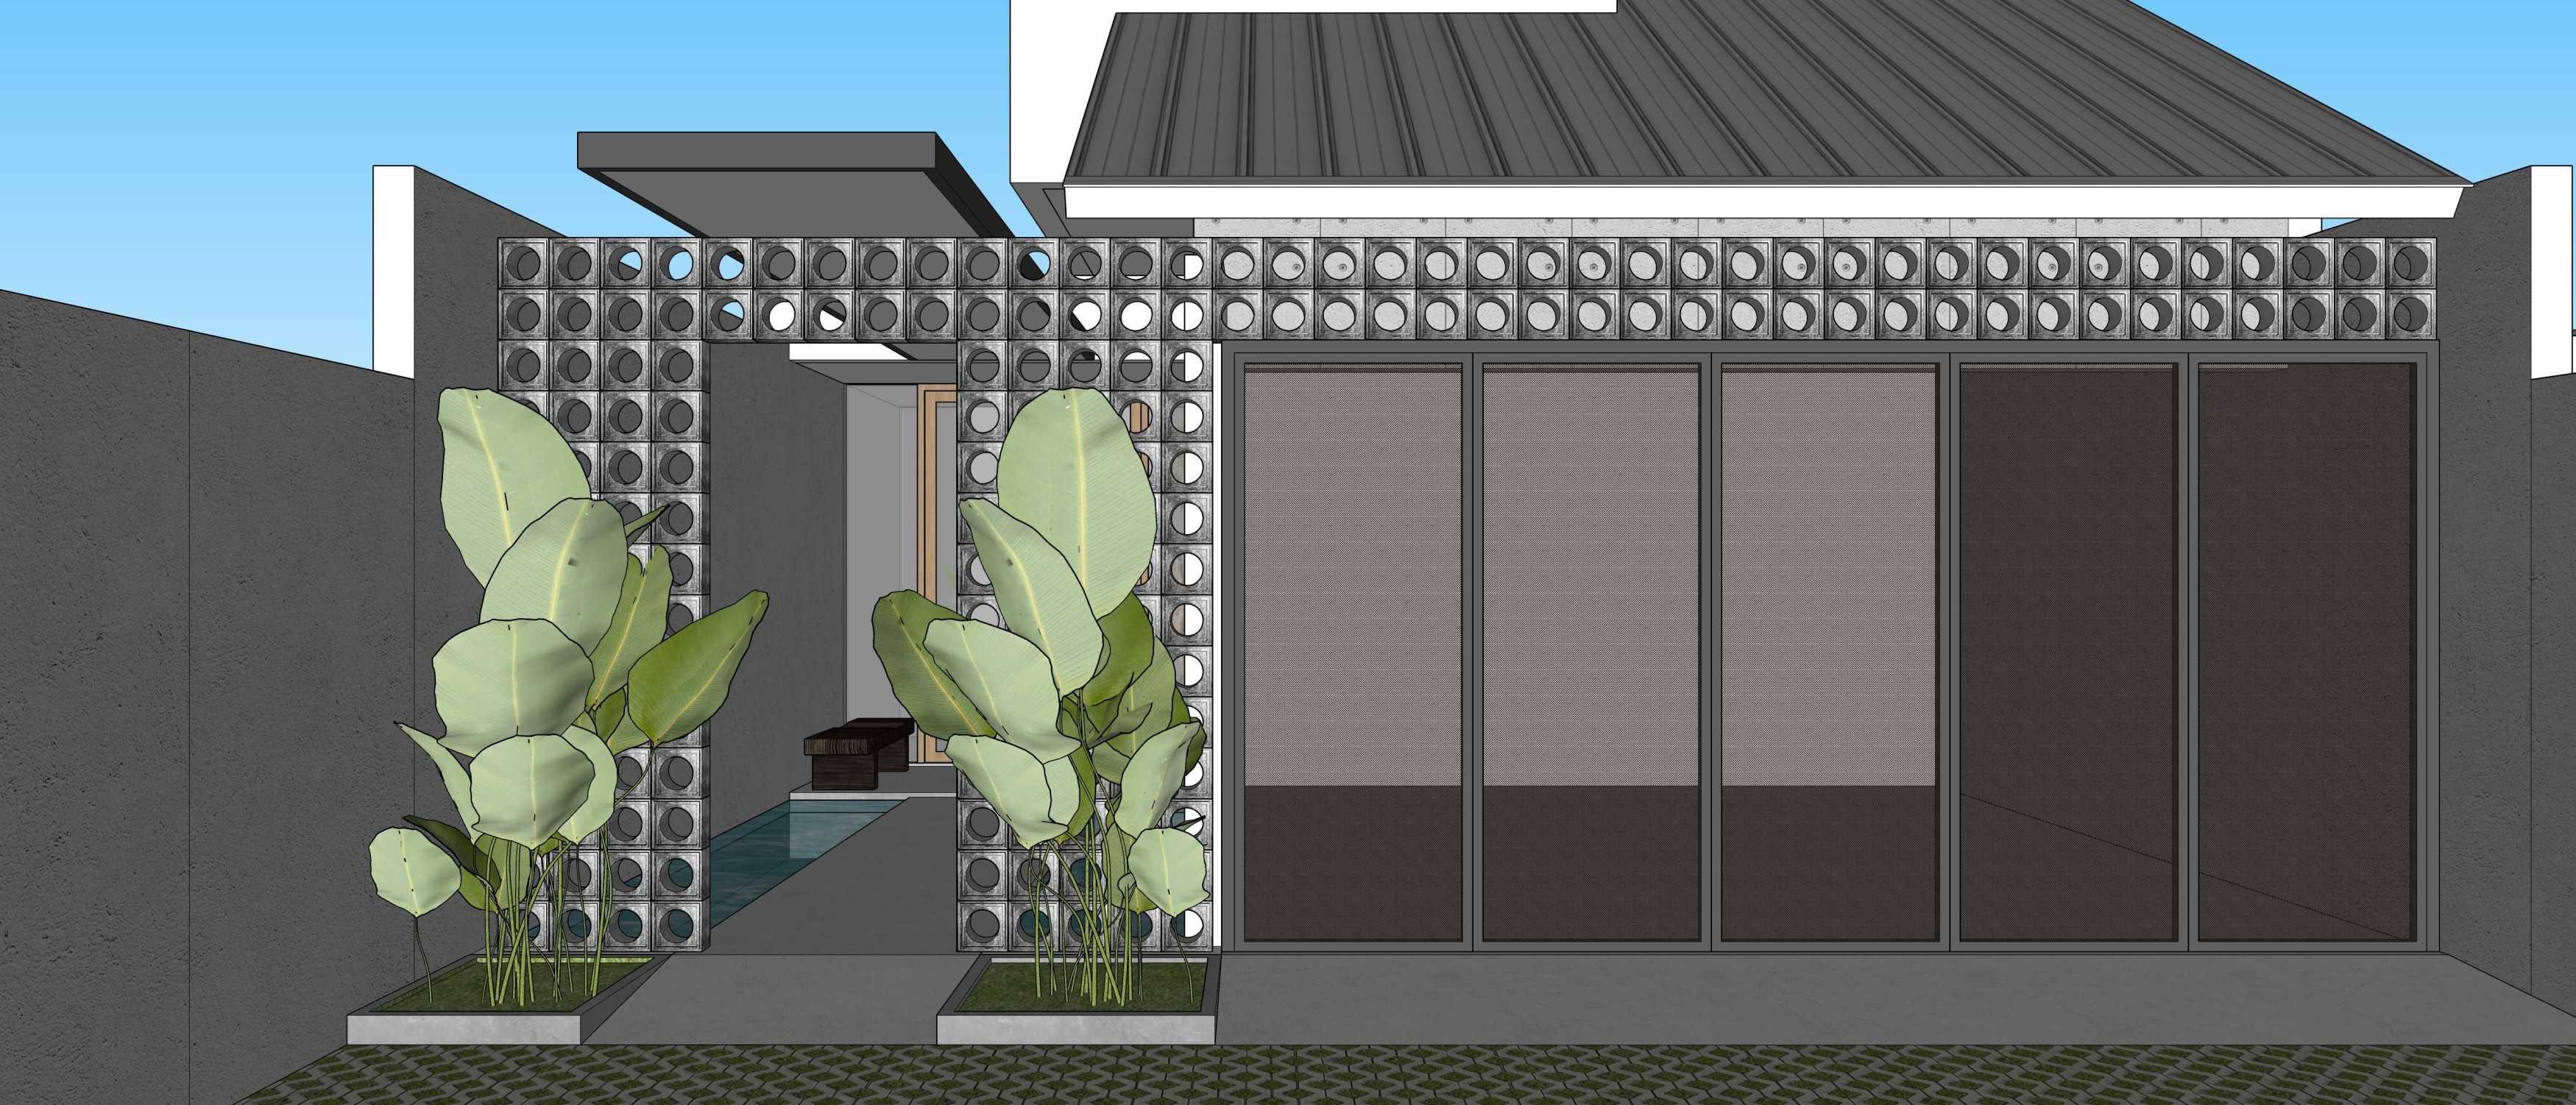 I+K  Studio Architects Able House Bekasi, Kota Bks, Jawa Barat, Indonesia Bekasi, Kota Bks, Jawa Barat, Indonesia Iswandiadam-Architect-Able-House Contemporary  110141